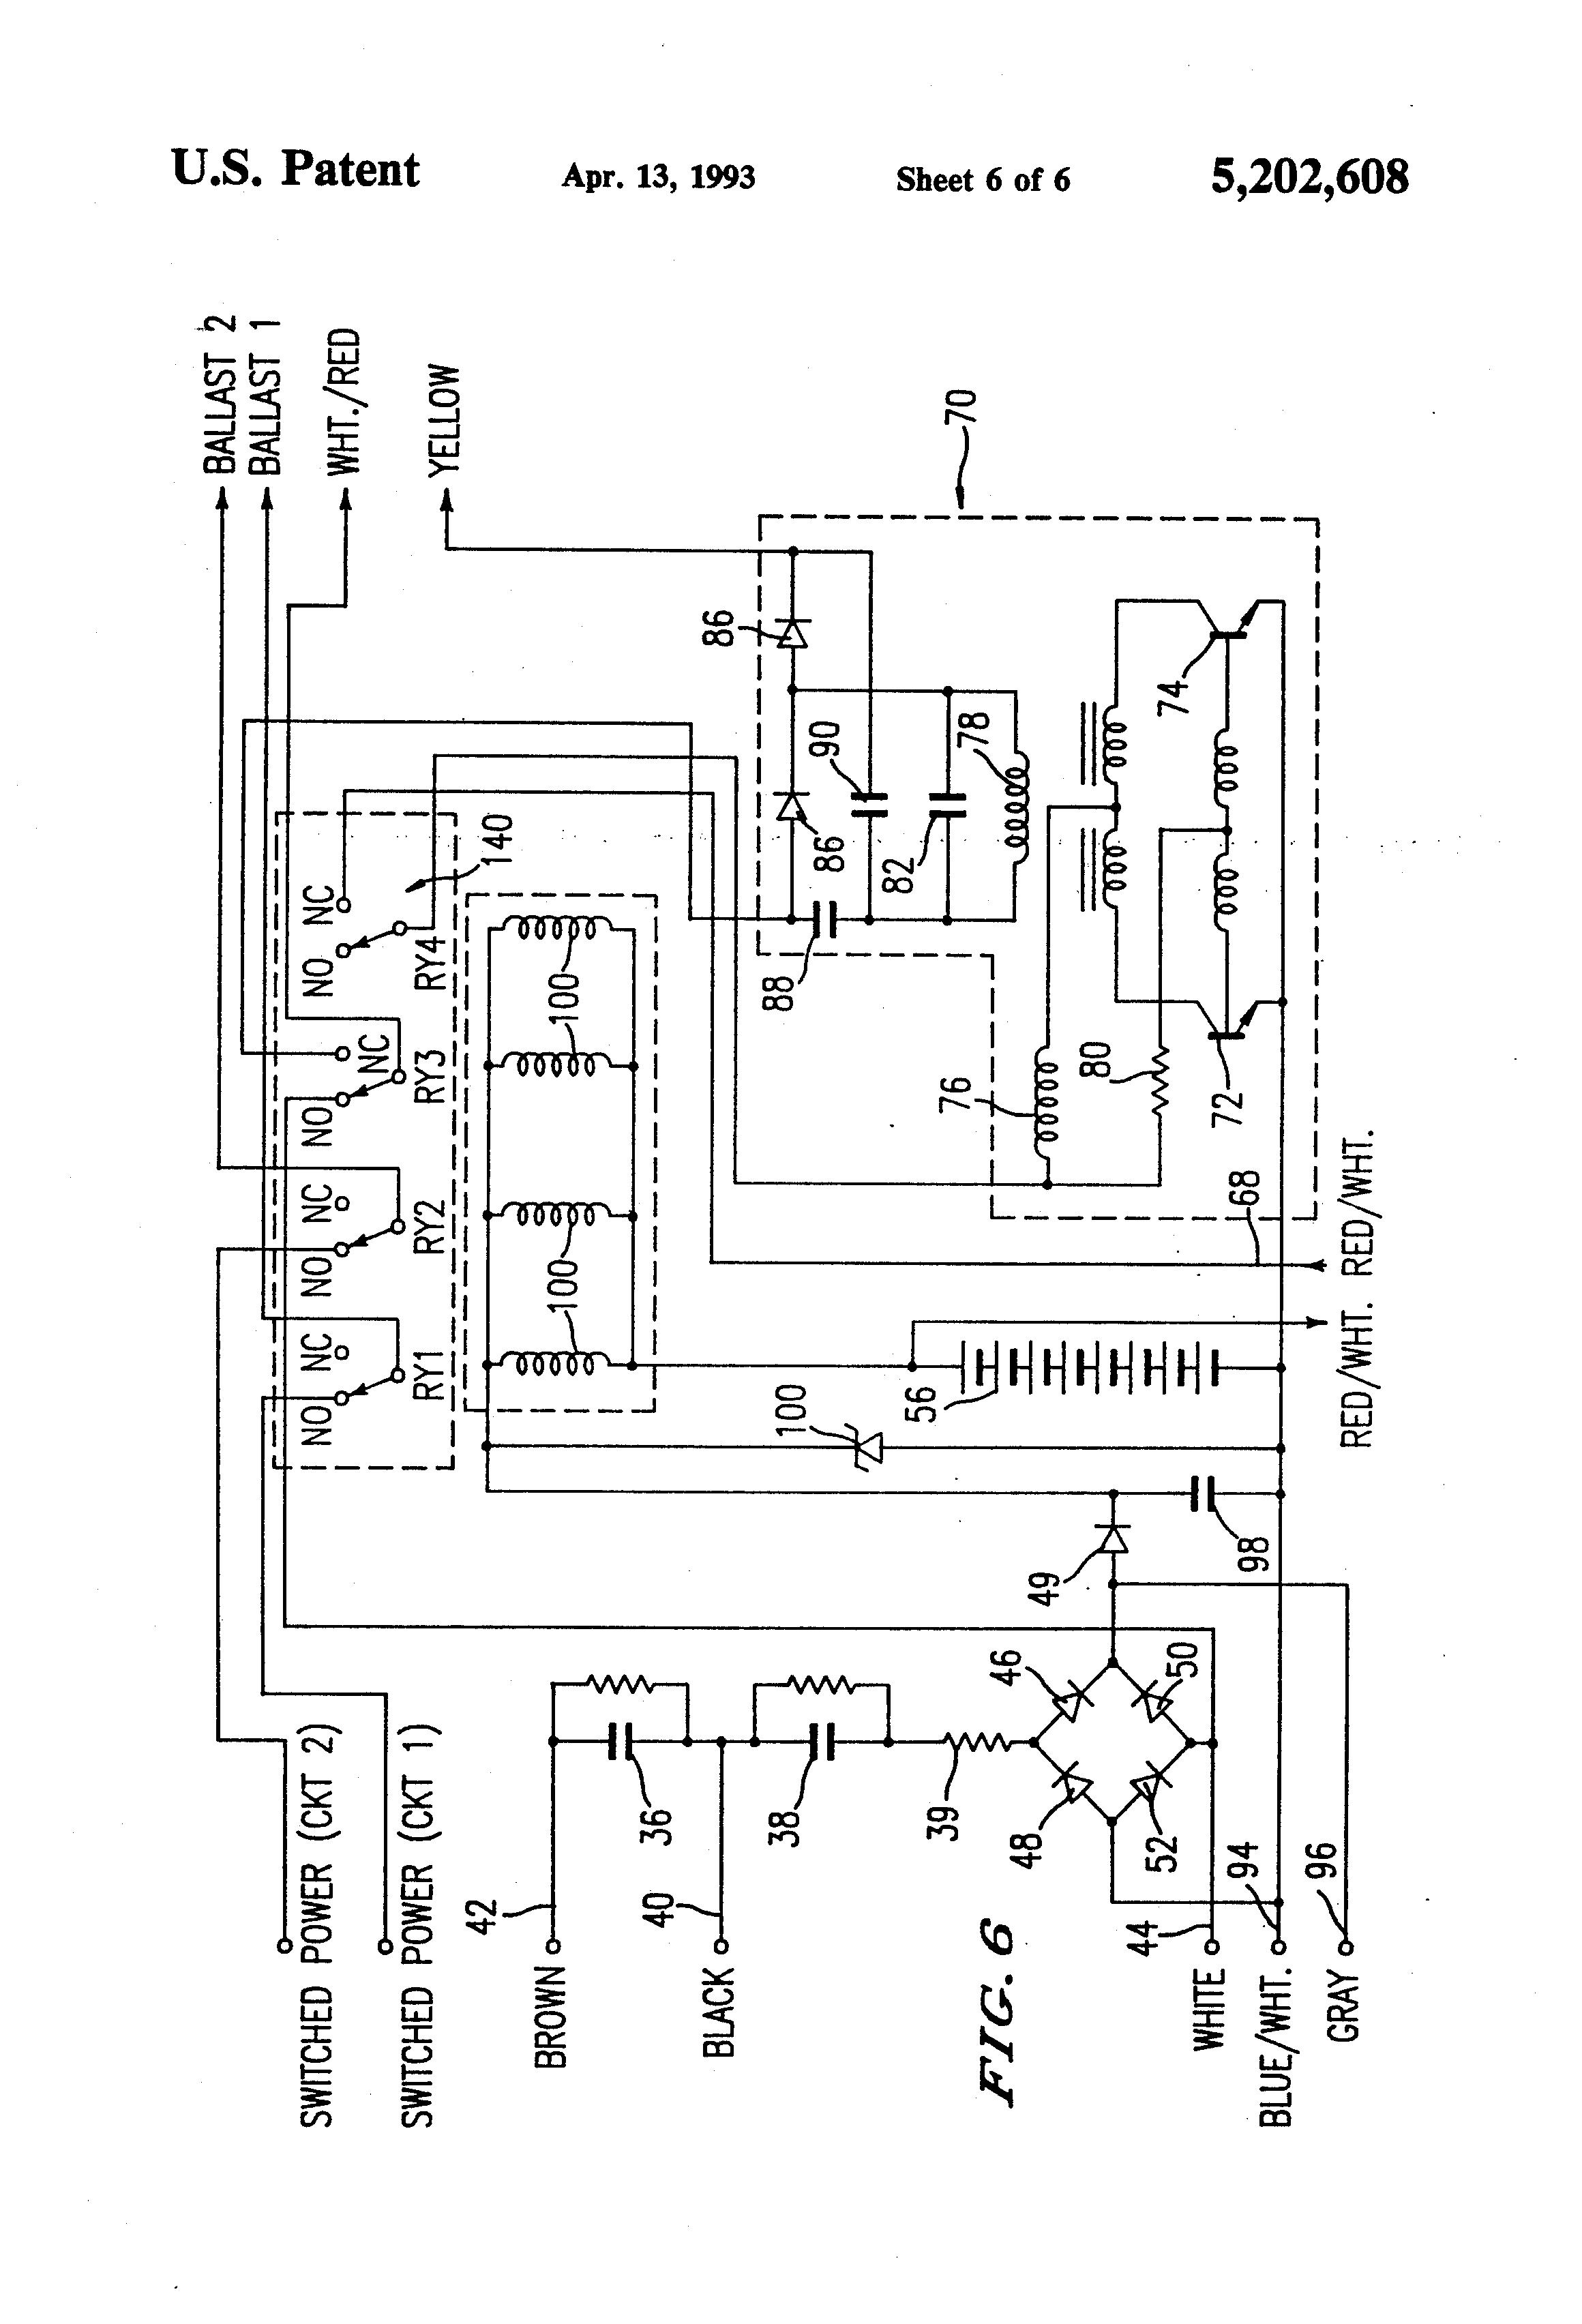 AH_8582] Bodine B50 Ballast Wiring Diagram Free DiagramTerch Phon Obenz Wida Tran Kapemie Mohammedshrine Librar Wiring 101